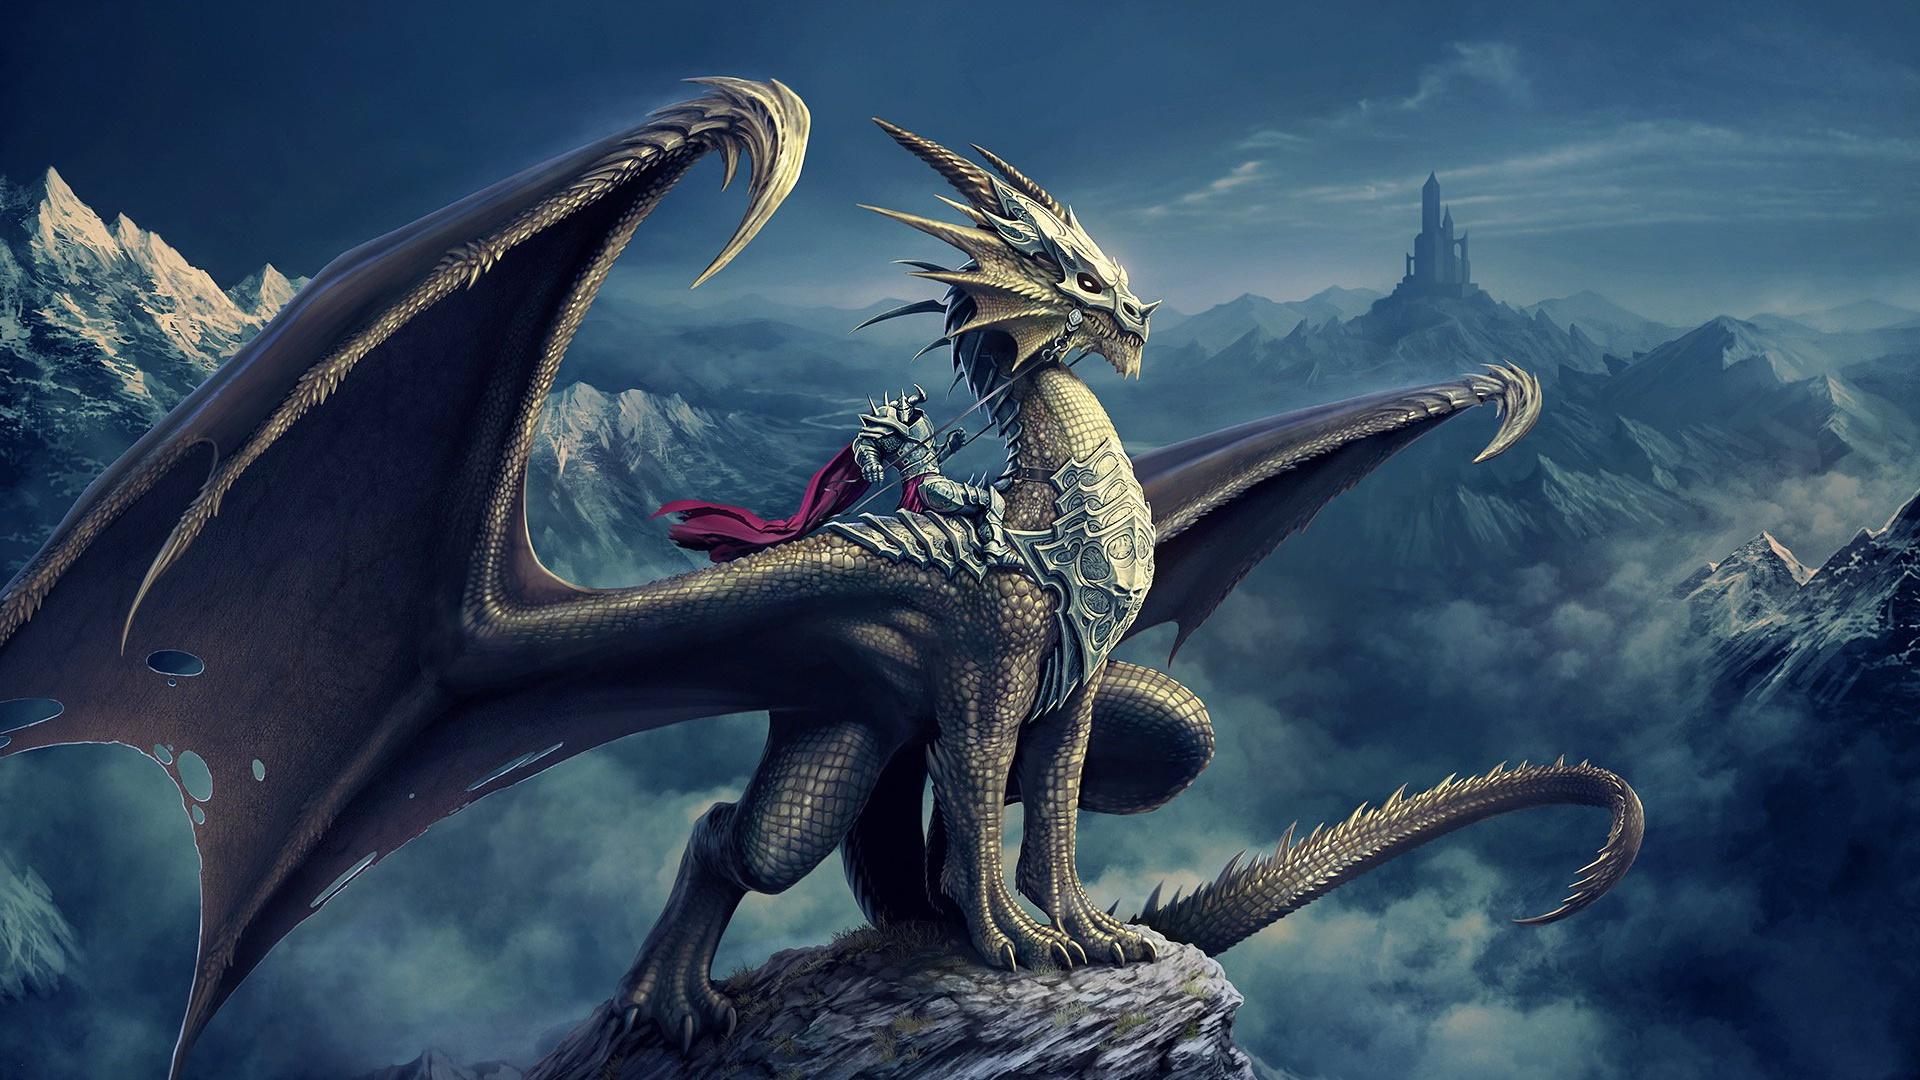 Resolution Fantasy Black Dragon Wallpaper HD 8   SiWallpaperHD 1621 1920x1080